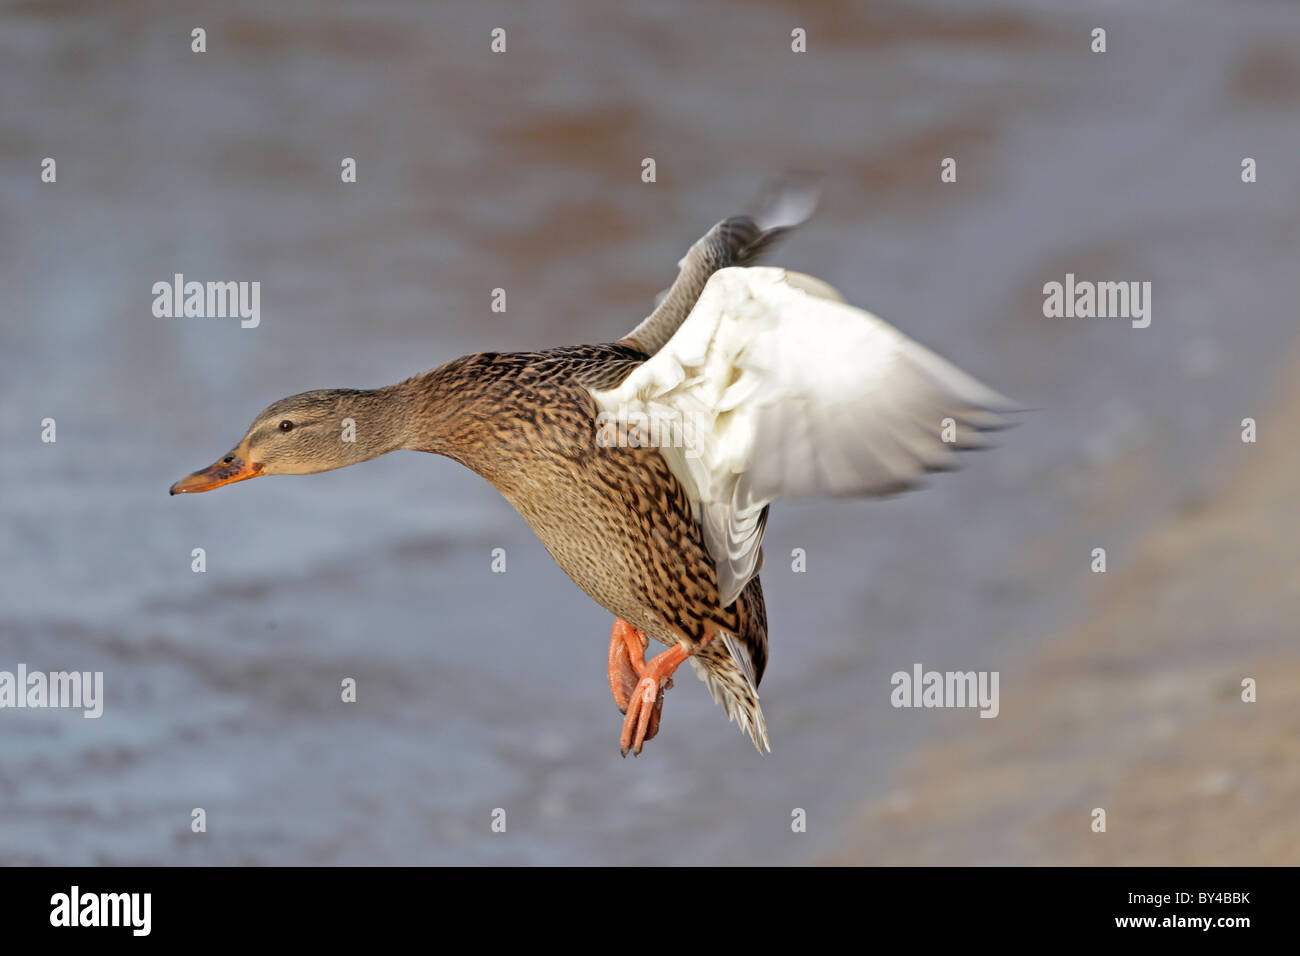 Female Mallard in flight - Stock Image